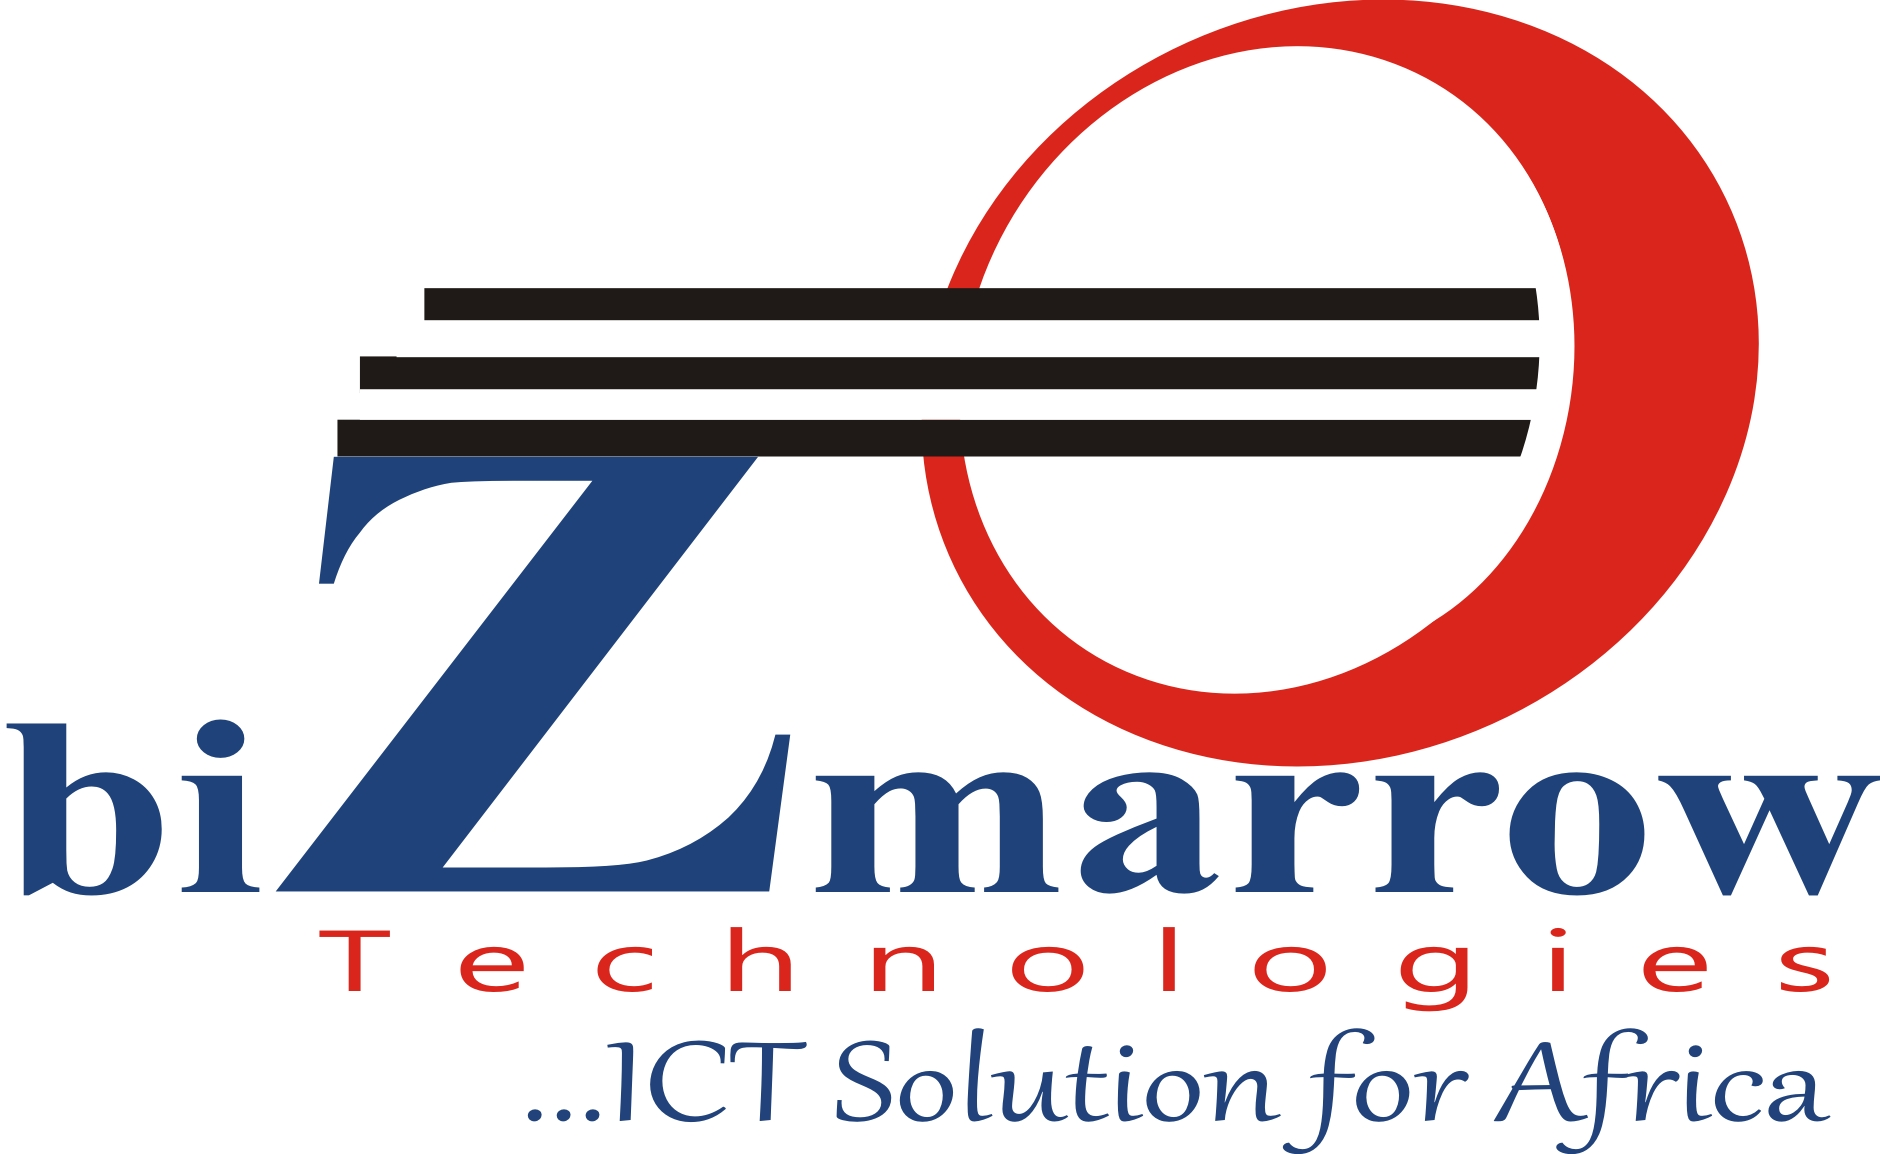 bizmarrow Logo